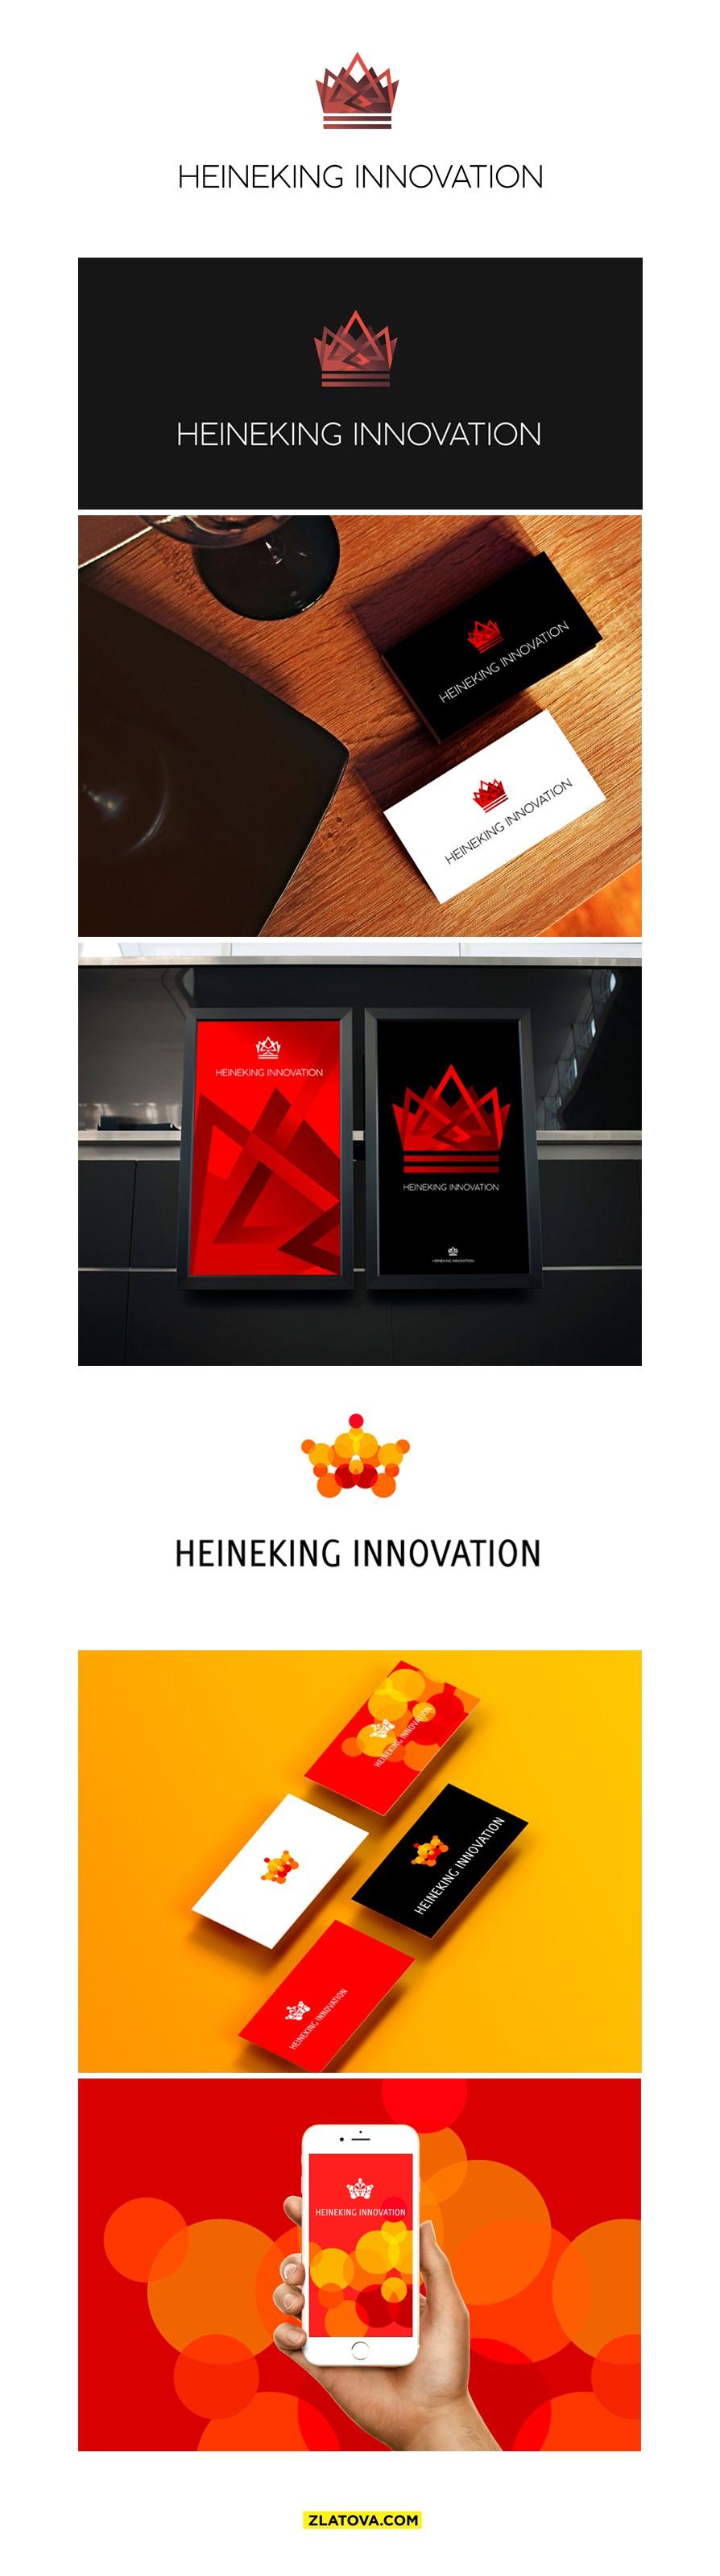 Heineking innovation